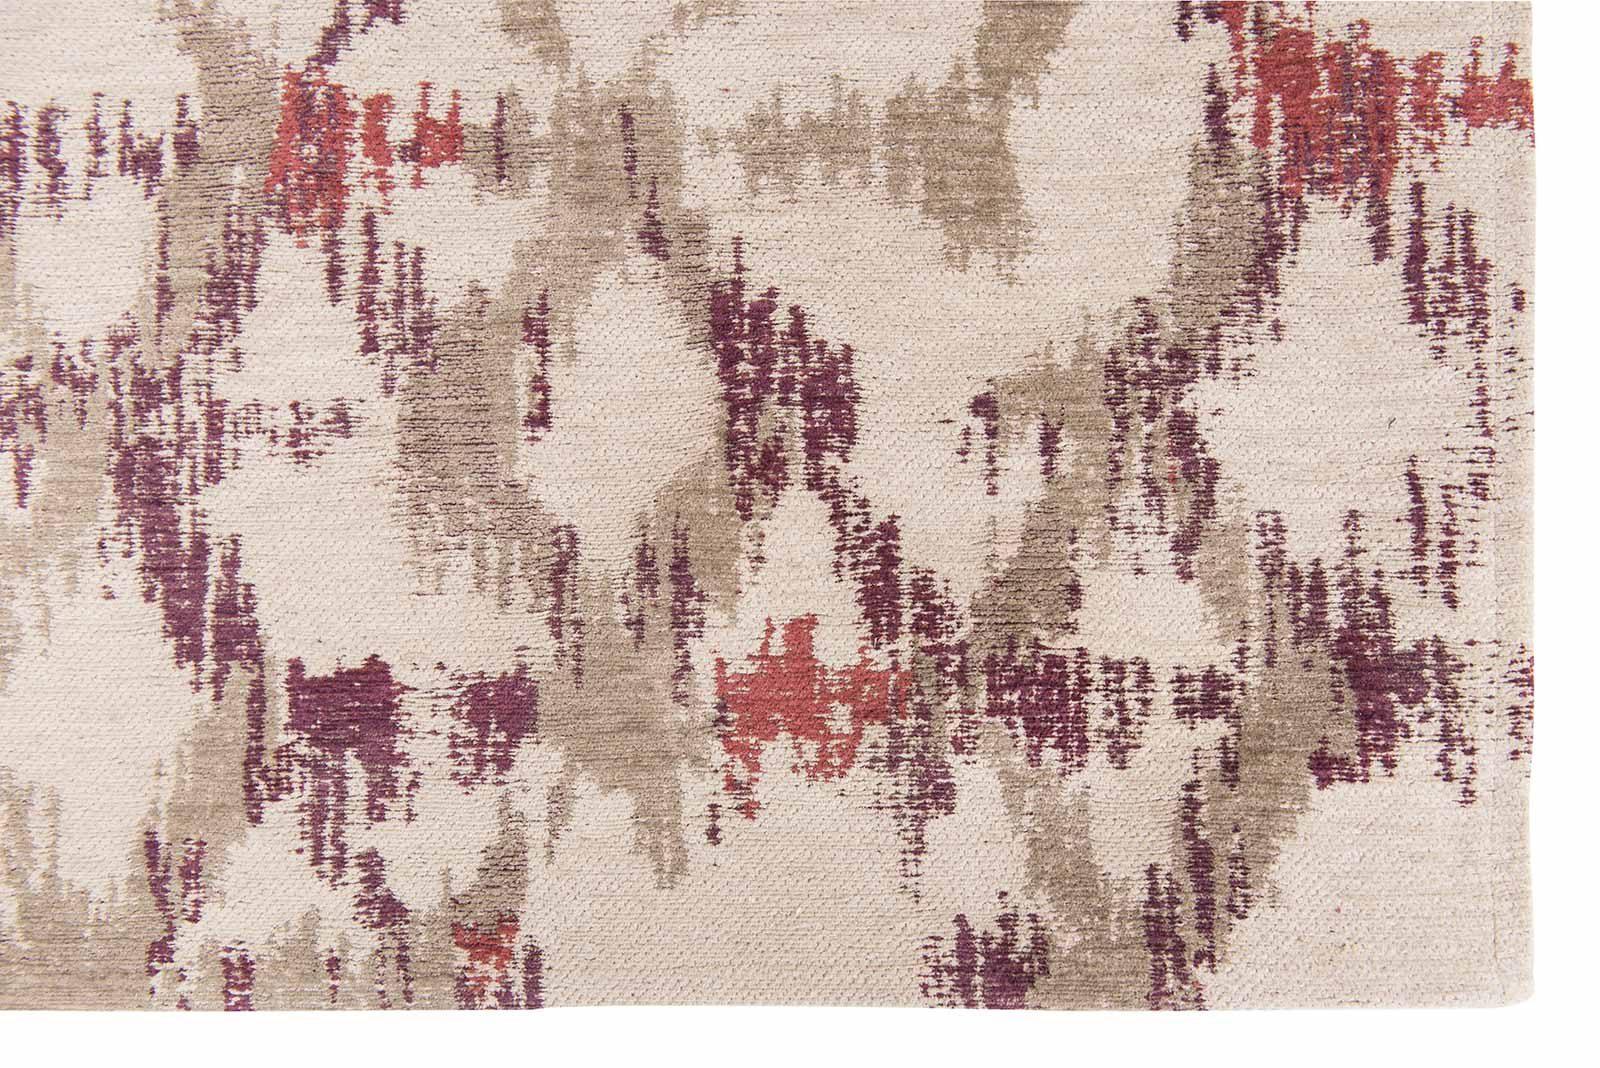 Louis De Poortere alfombras Villa Nova LX 8752 Sudare Jewel corner